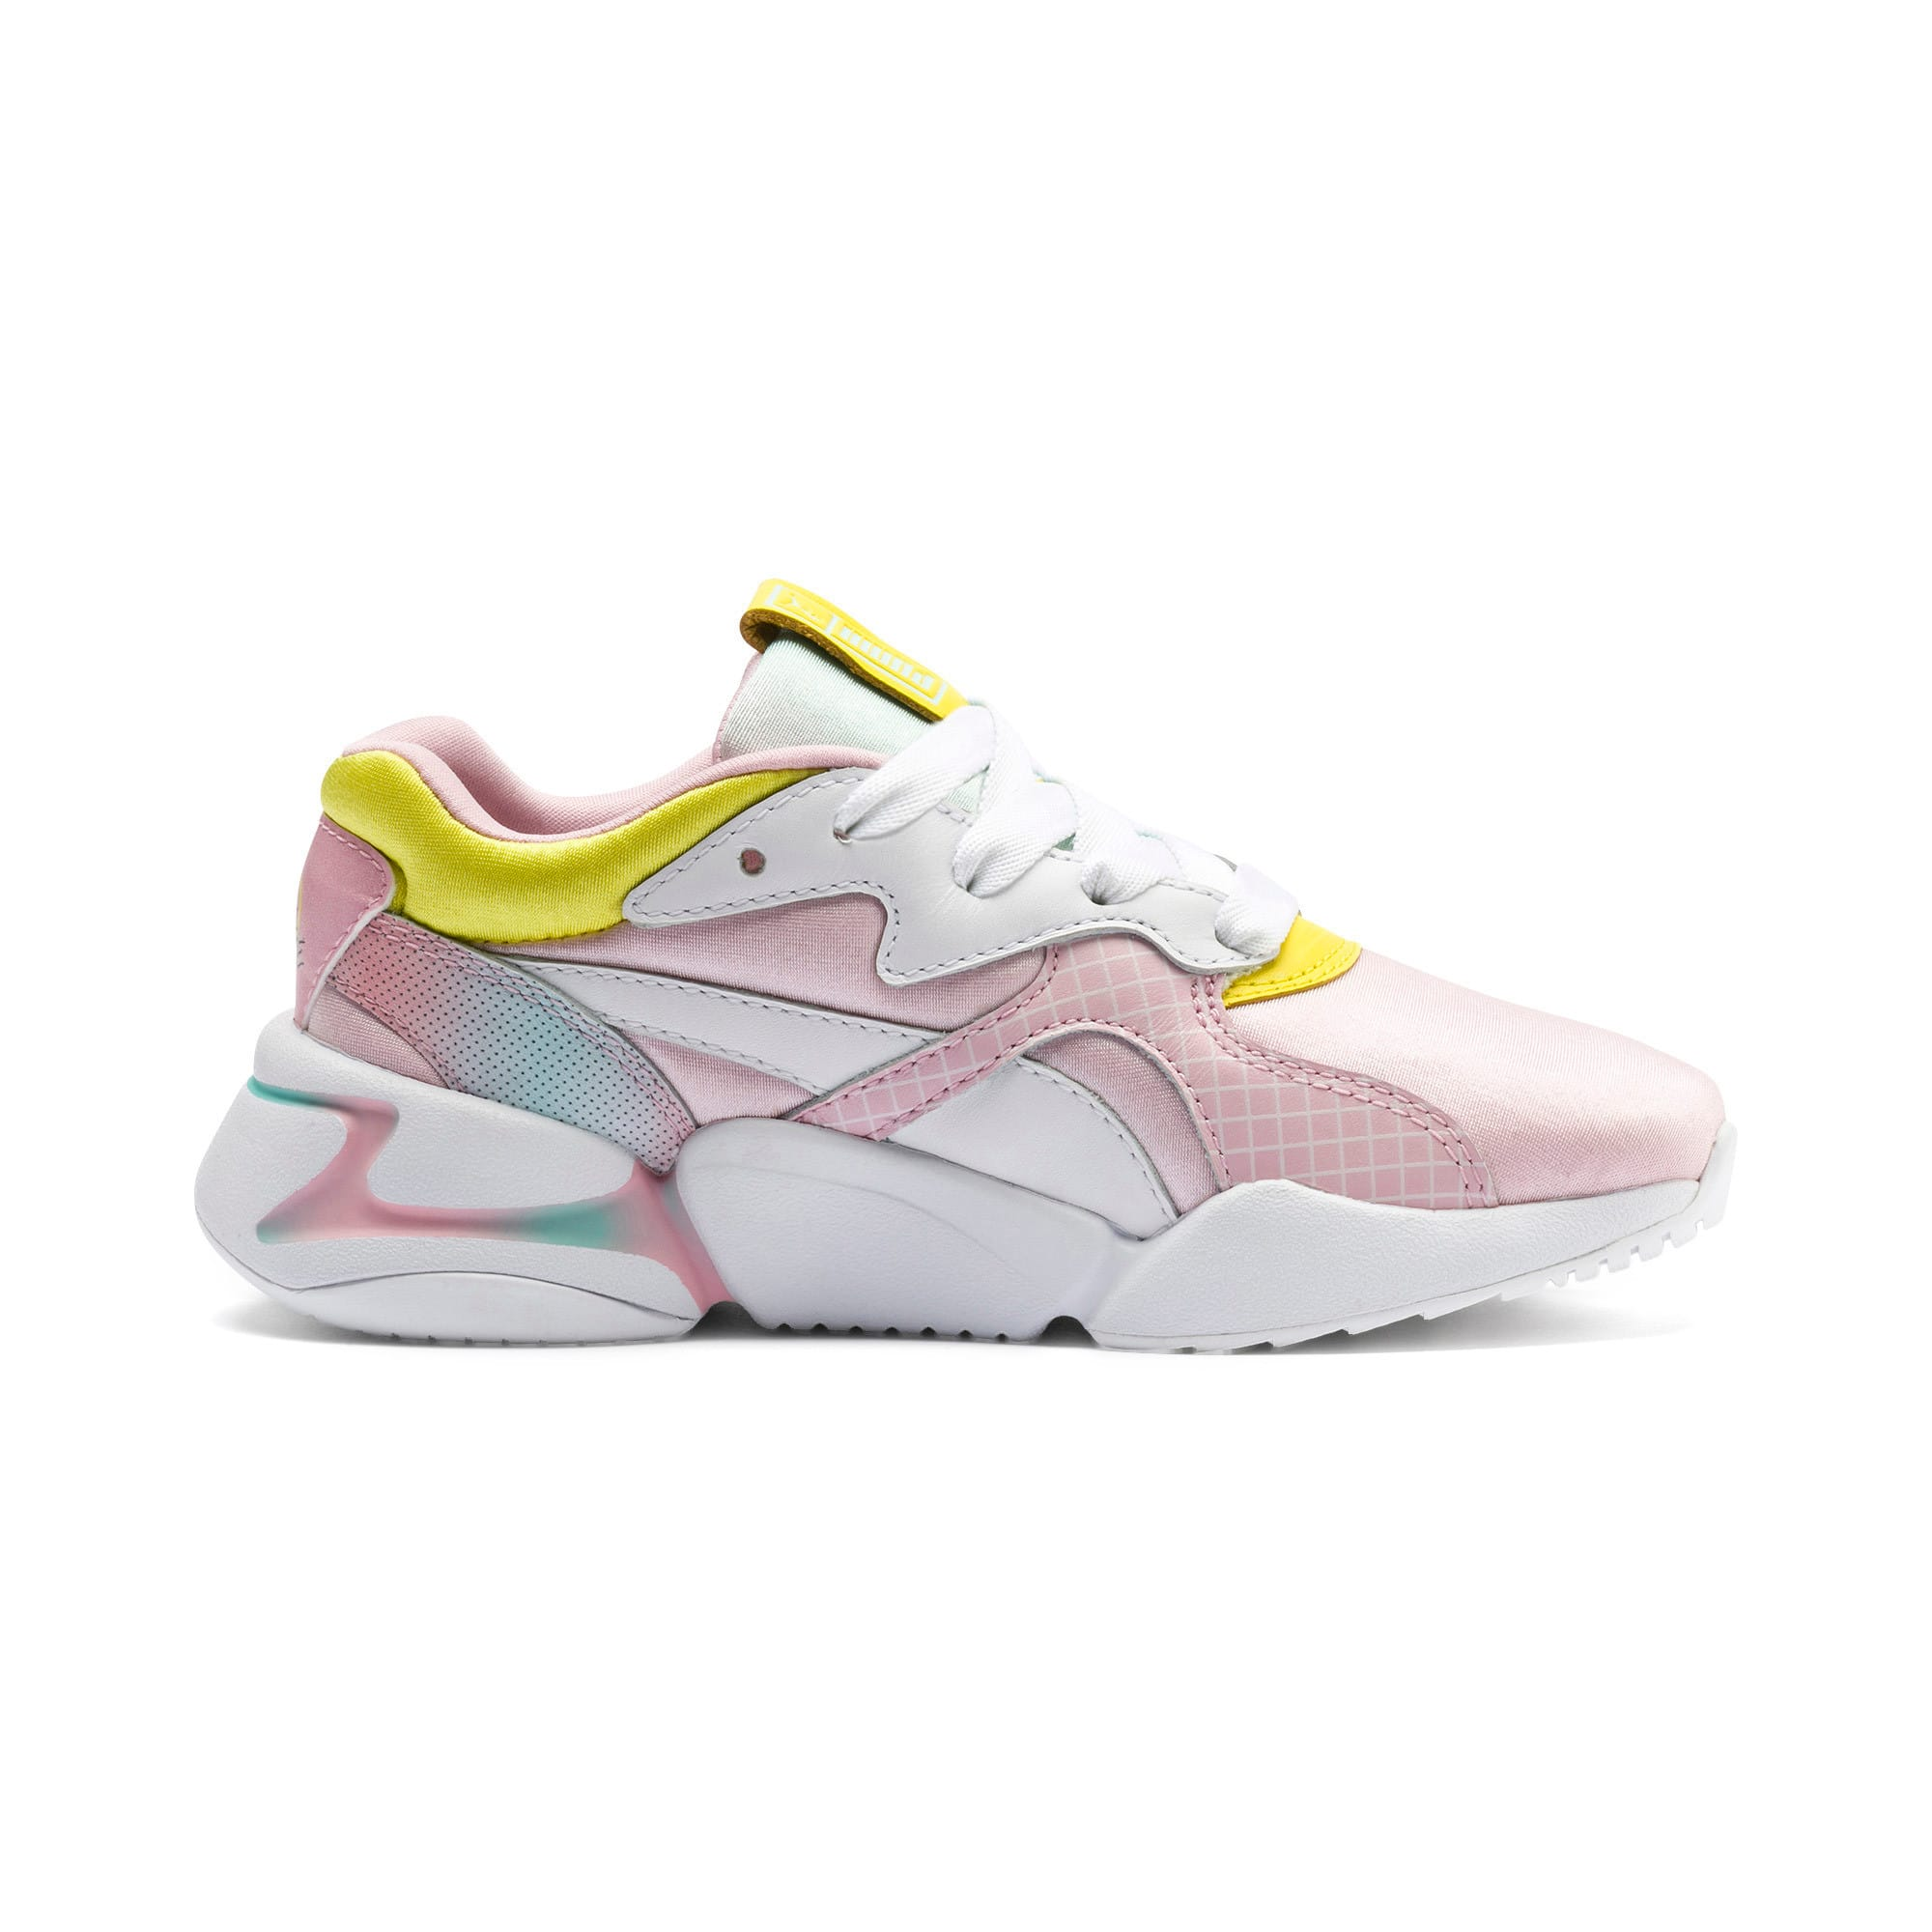 Thumbnail 5 of Nova x Barbie Little Kids' Shoes, Orchid Pink-Puma White, medium